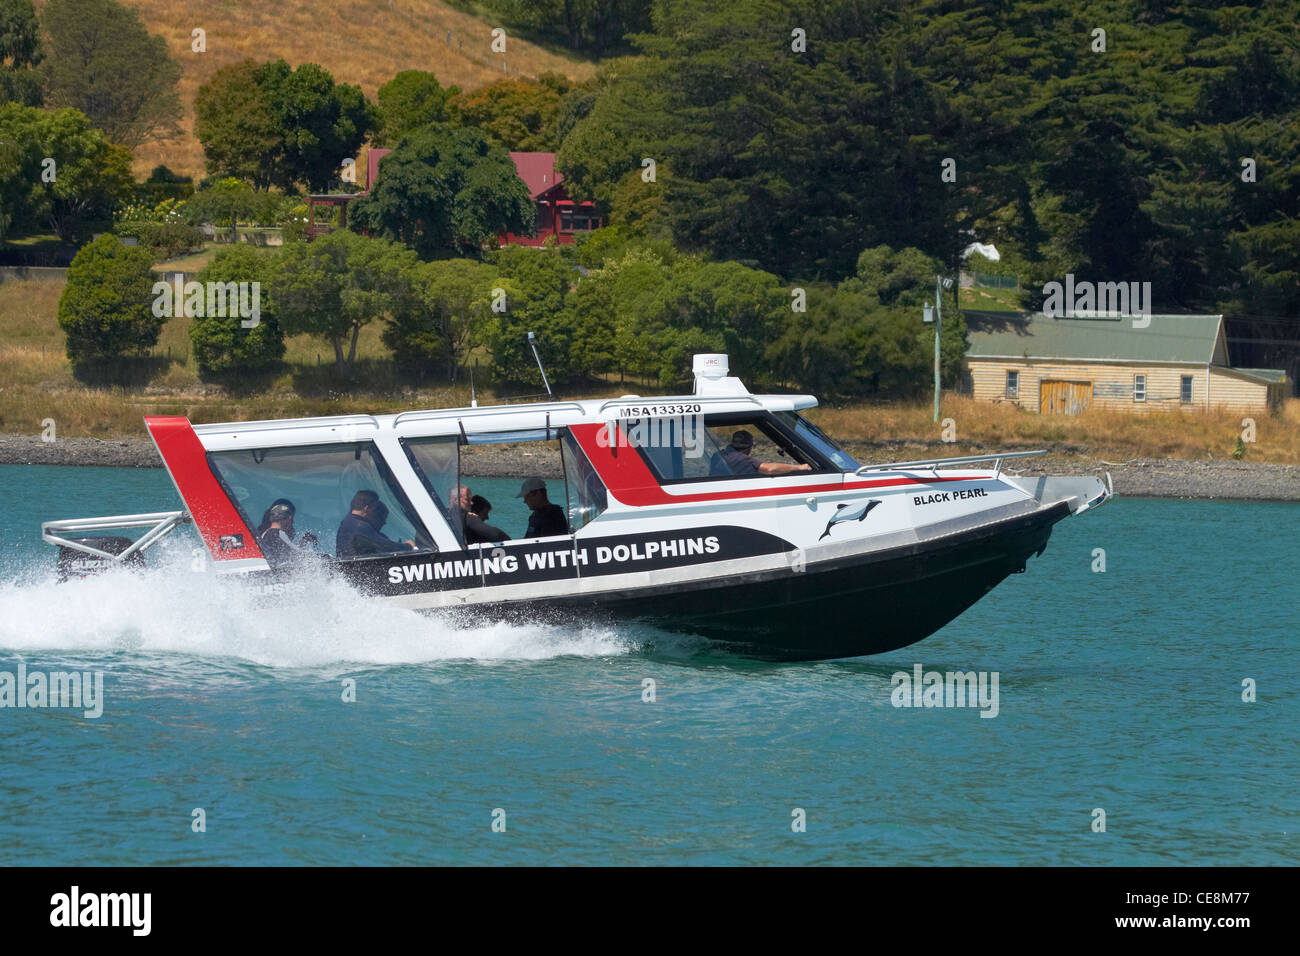 Swimming with dolphins boat, Black Cat Cruises, Akaroa Harbour, Banks Peninsula, Canterbury, South Island, New Zealand - Stock Image